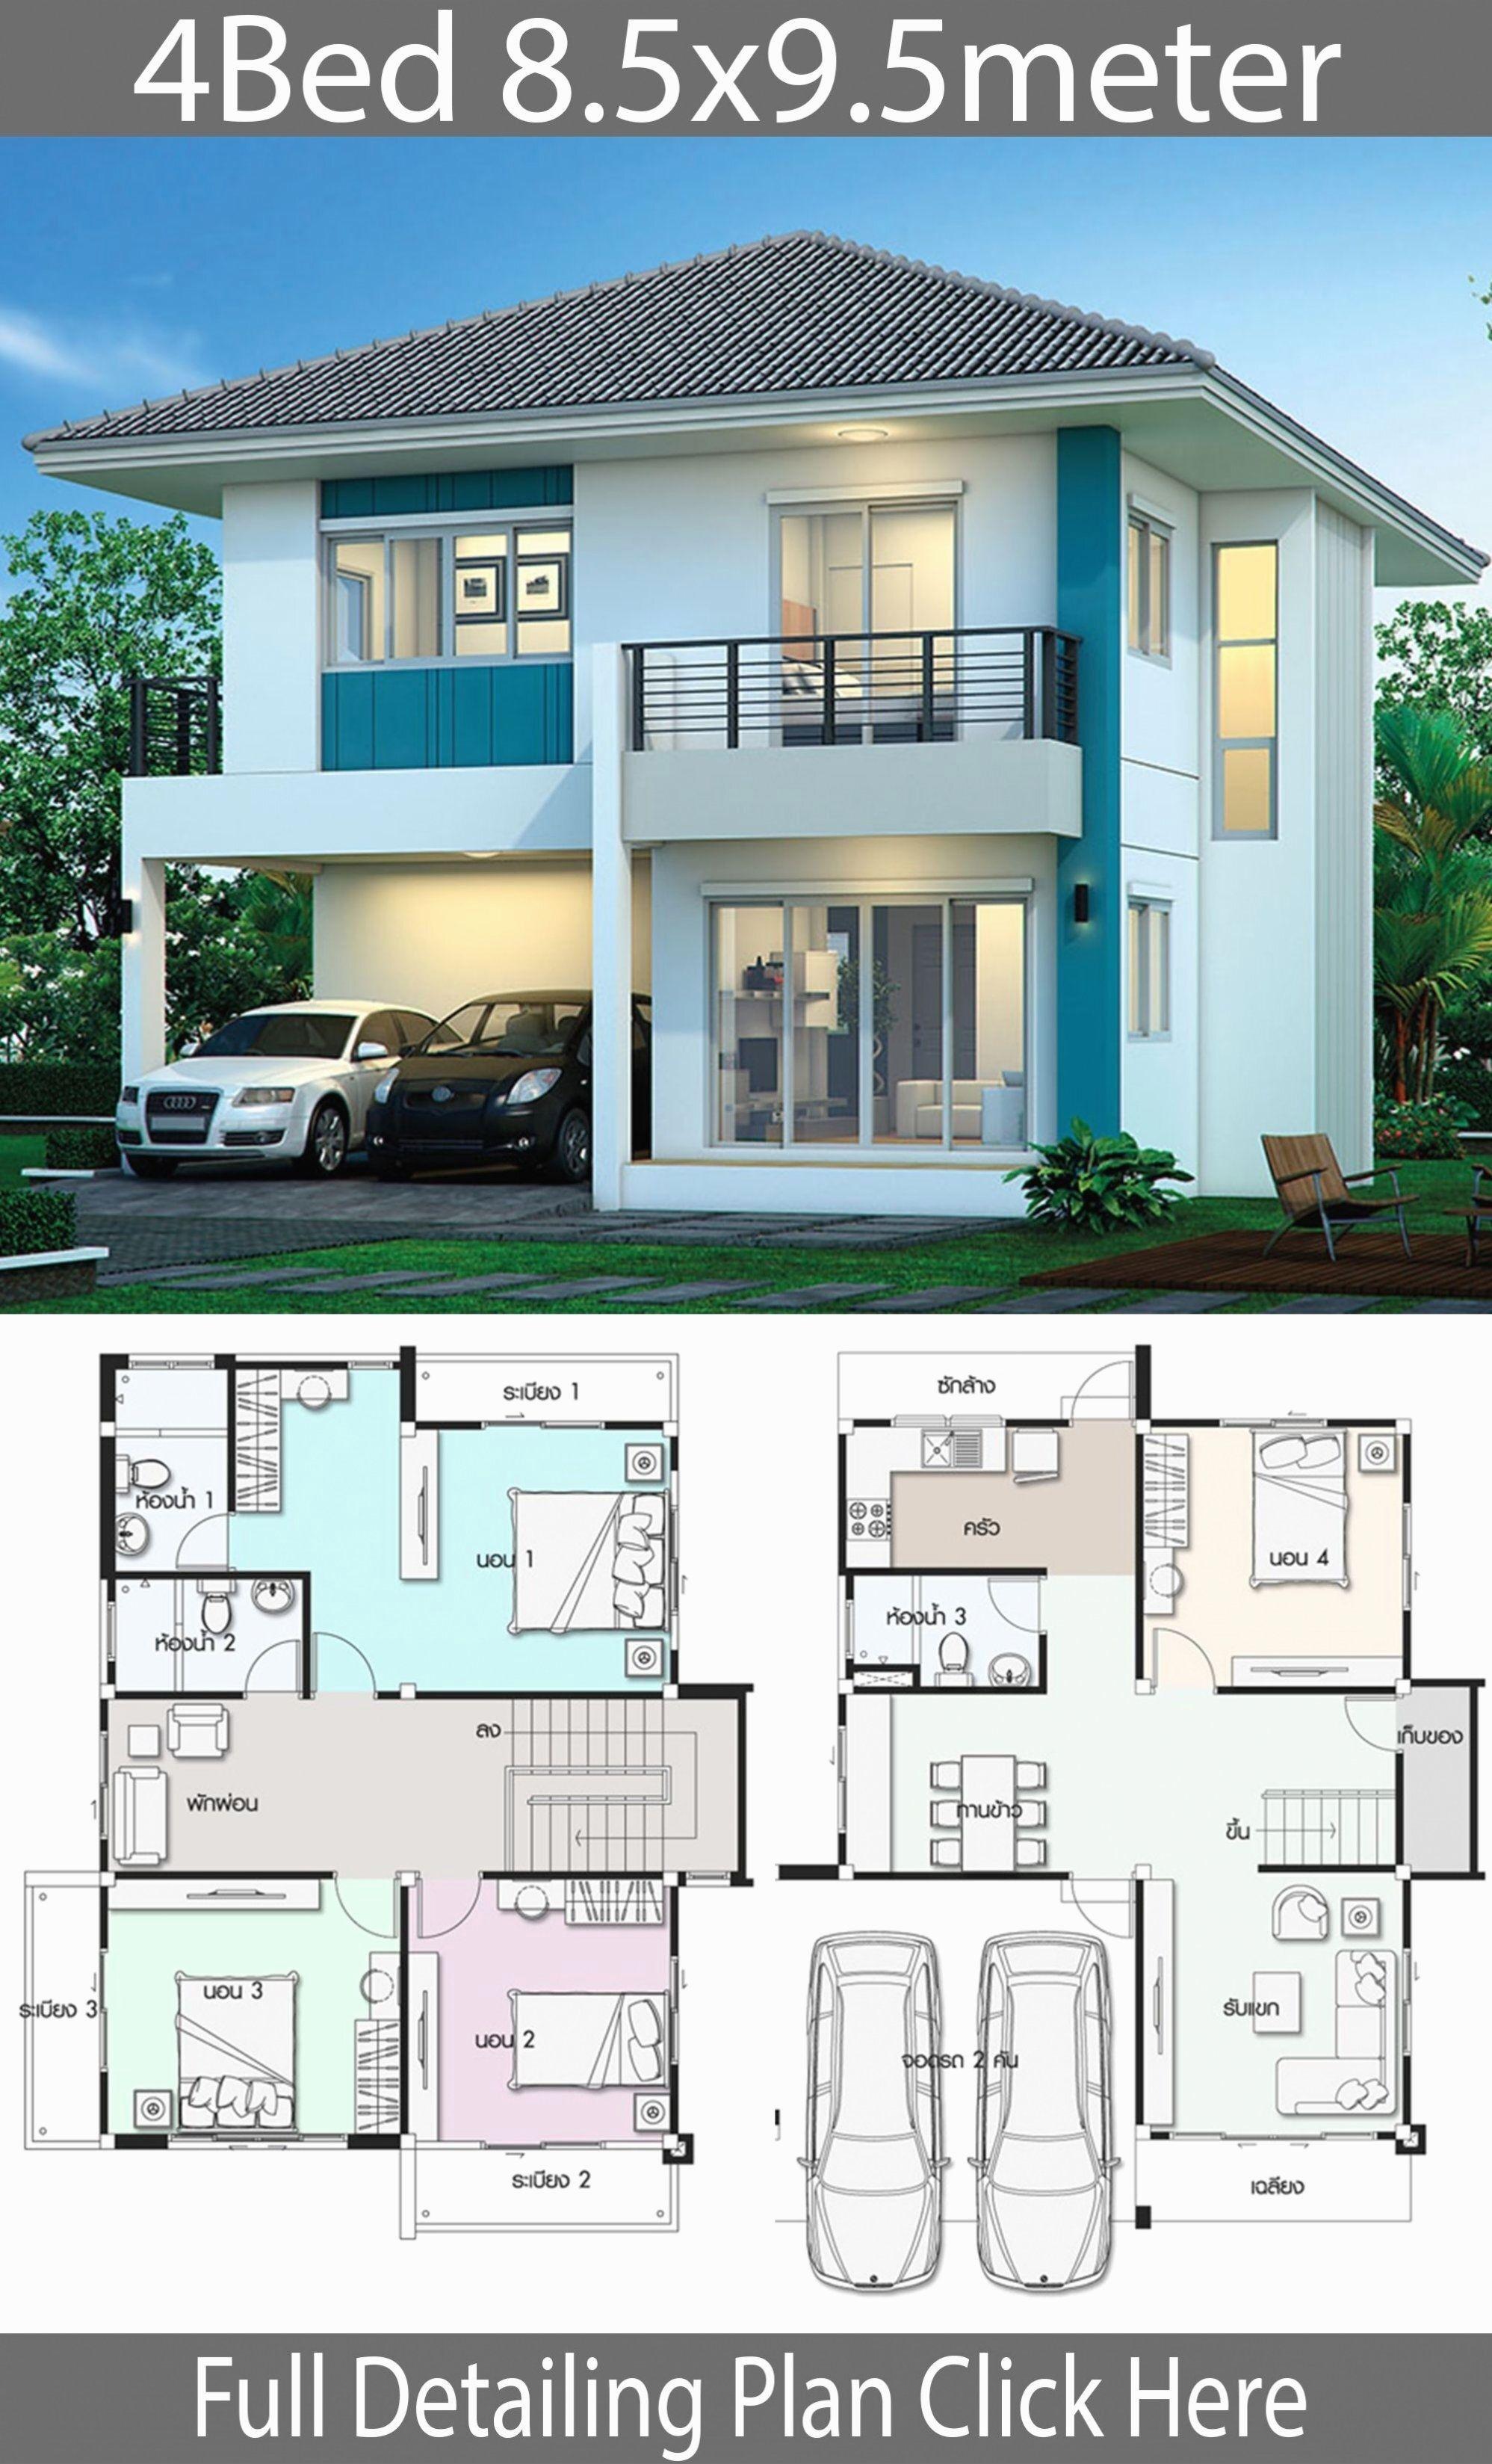 Haus Design Plan 8 5x9 5m Mit 4 Schlafzimmer Haus Idee In 2020 Small House Design Exterior House Designs Exterior 2 Storey House Design